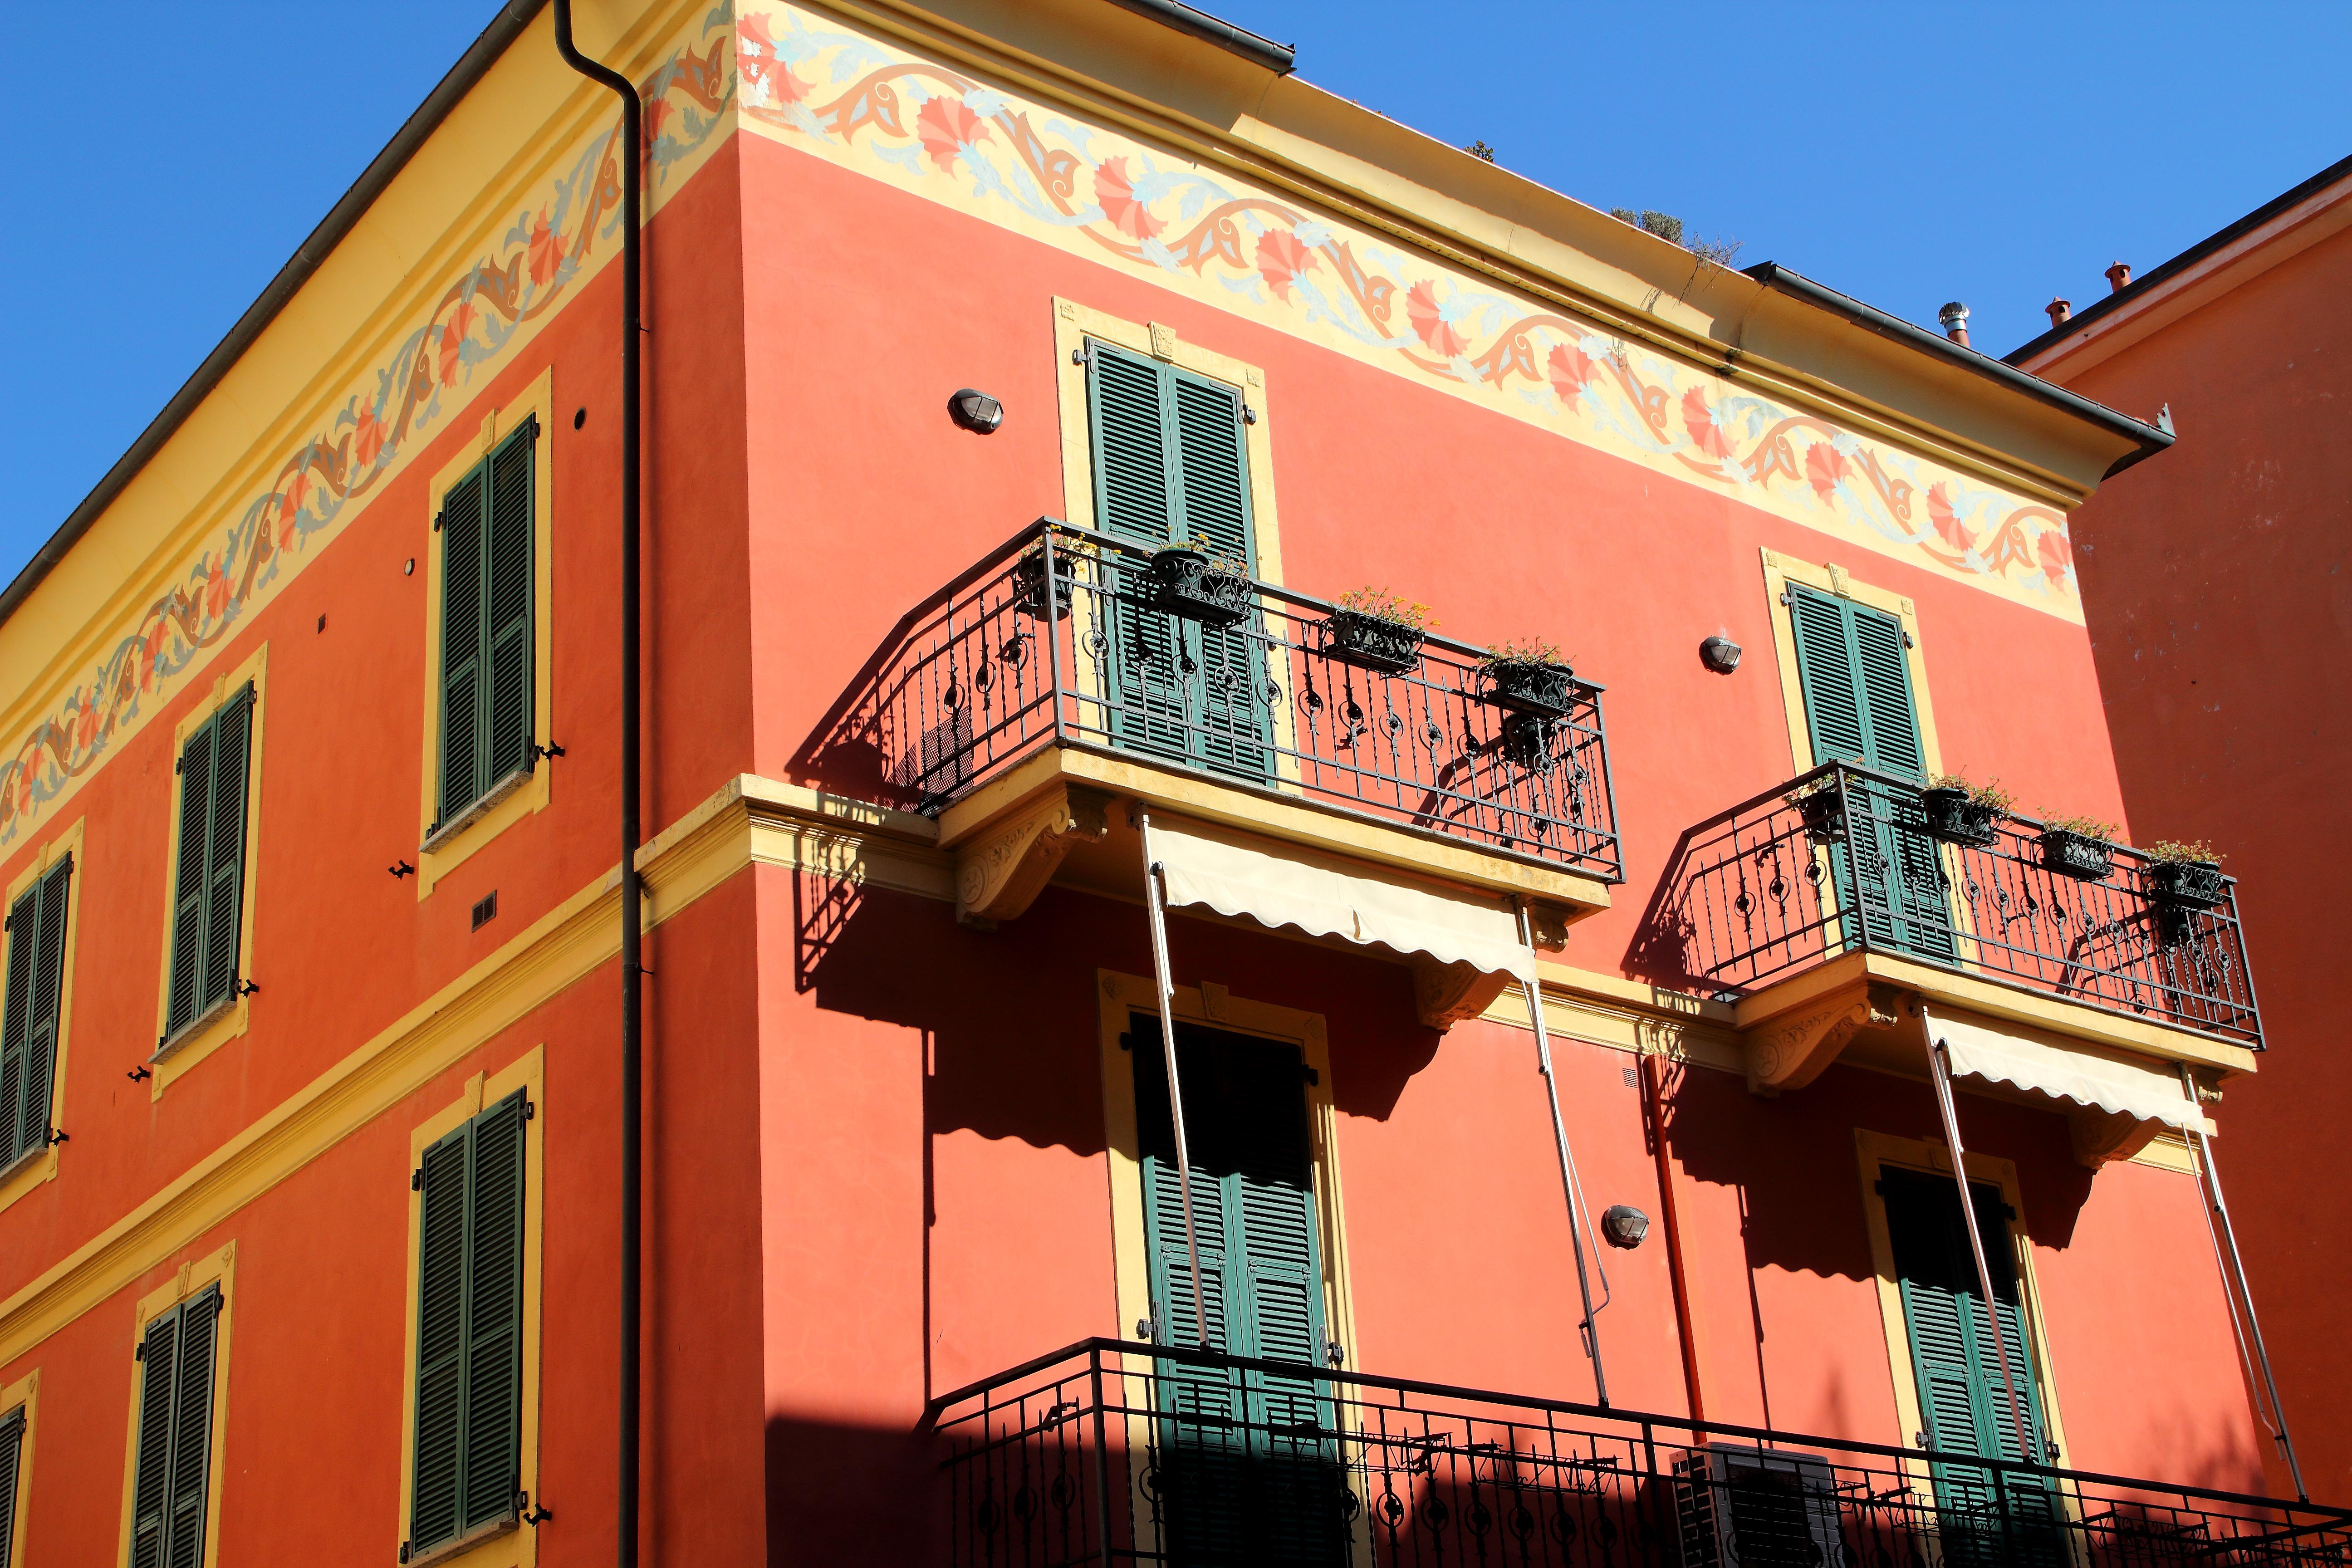 <p>Давам стая за момиче с голям балкон.&nbsp;(обява)</p>